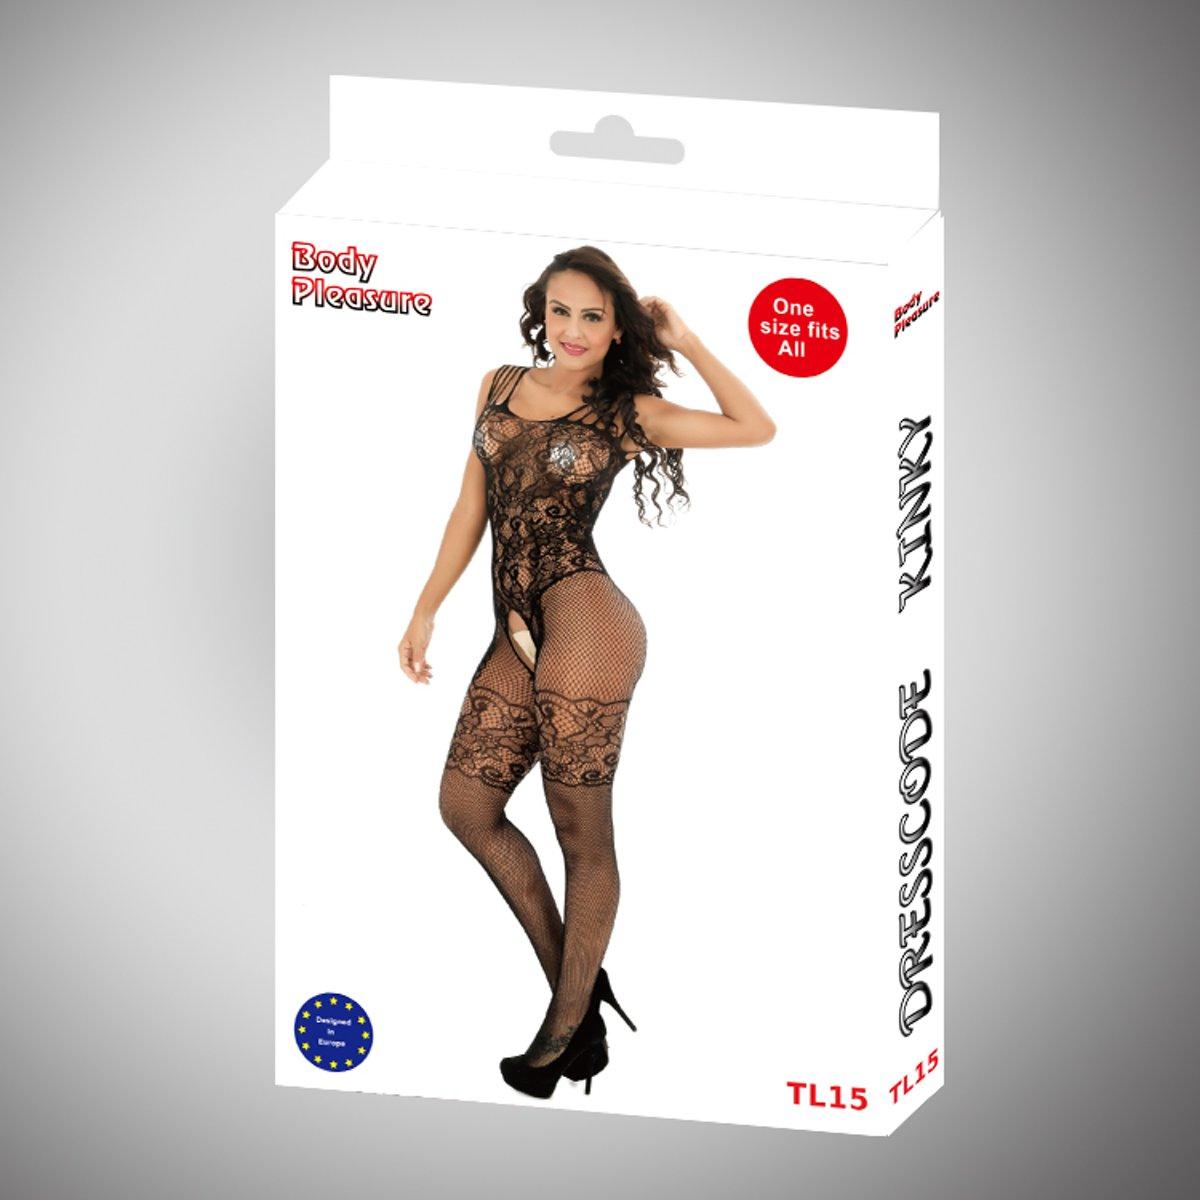 Foto van Body Pleasure - Super Lingerie set - Super uitdagende Body - TL15 - Verpakt in gave body pleasure cadeaubox